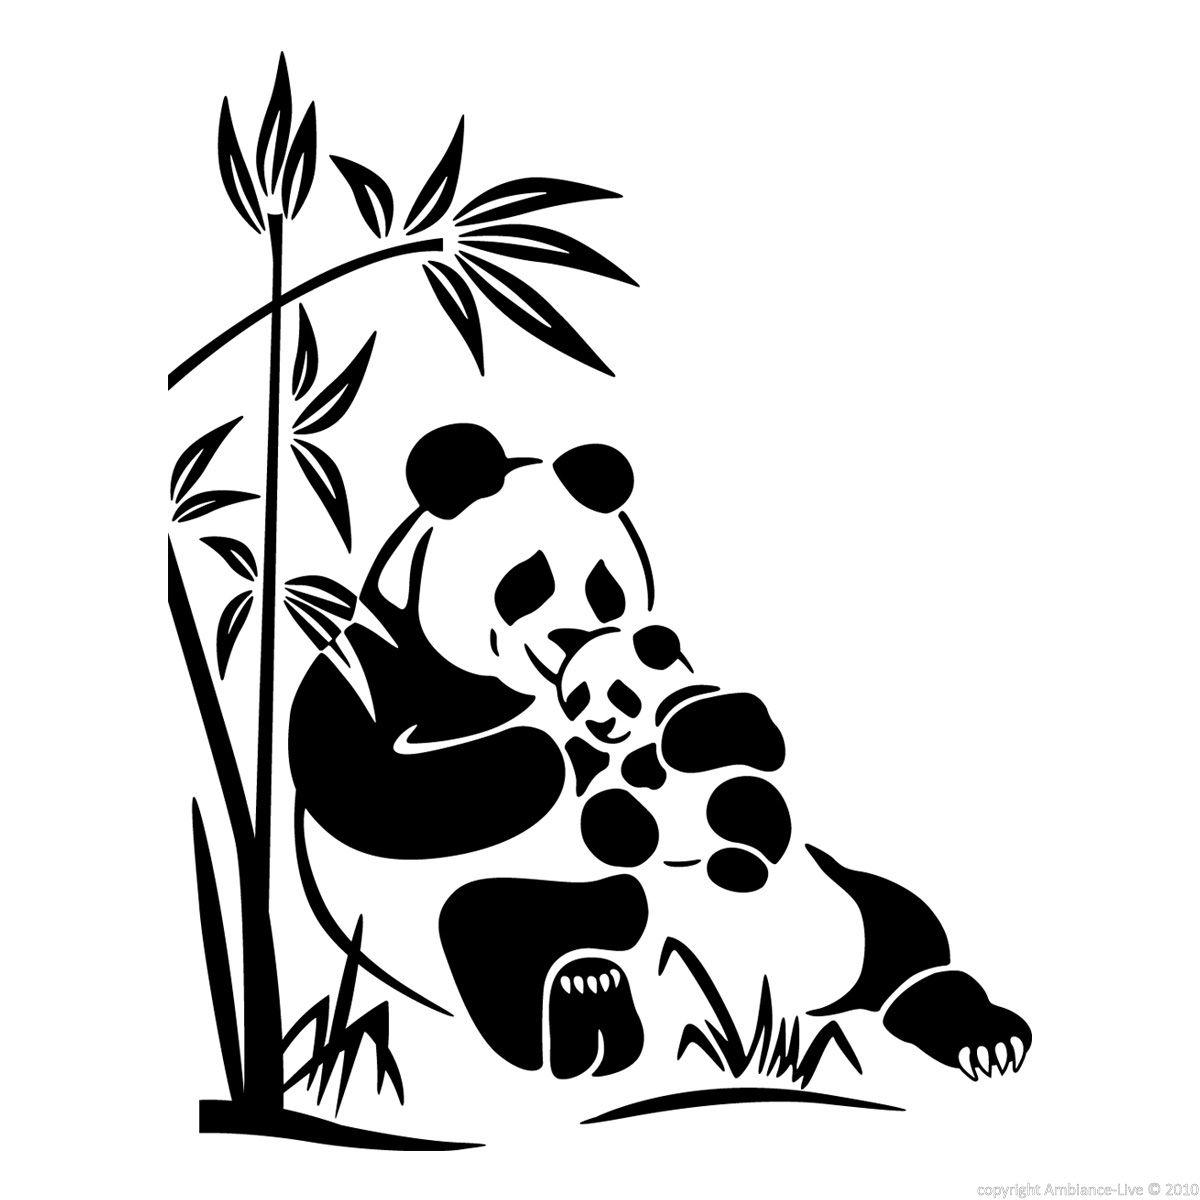 Dessins pandas rigolos recherche google panda - Dessins de panda ...